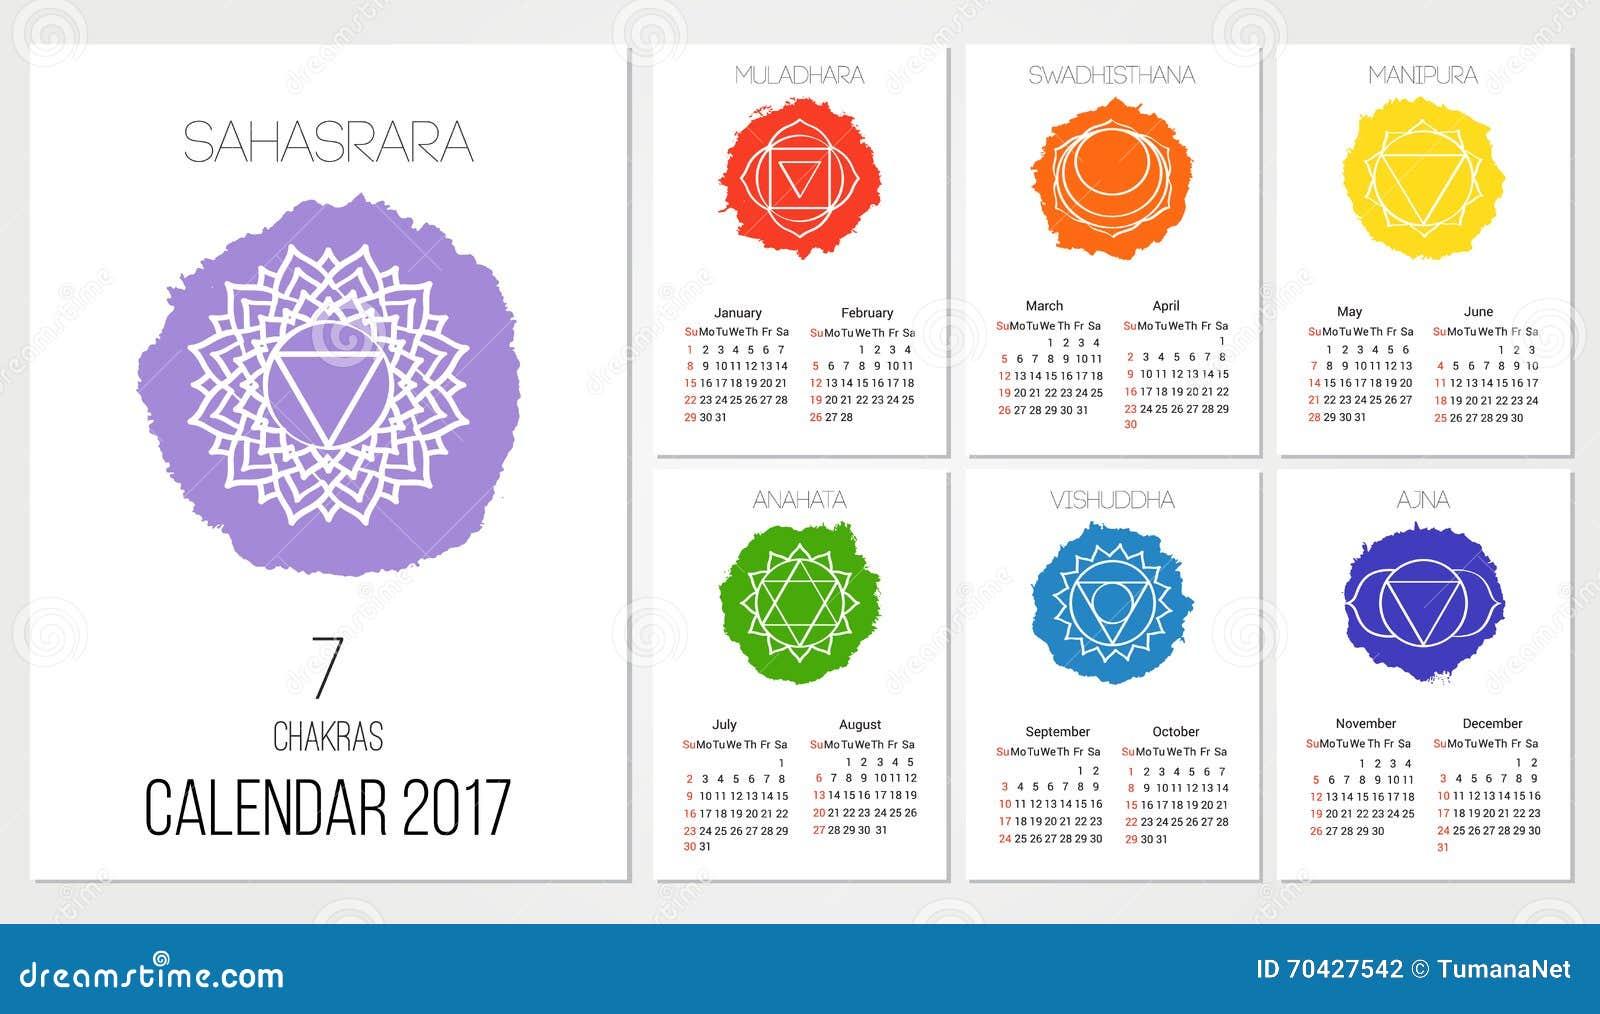 Hindu Calendar Design : Calendar design template with chakras set of